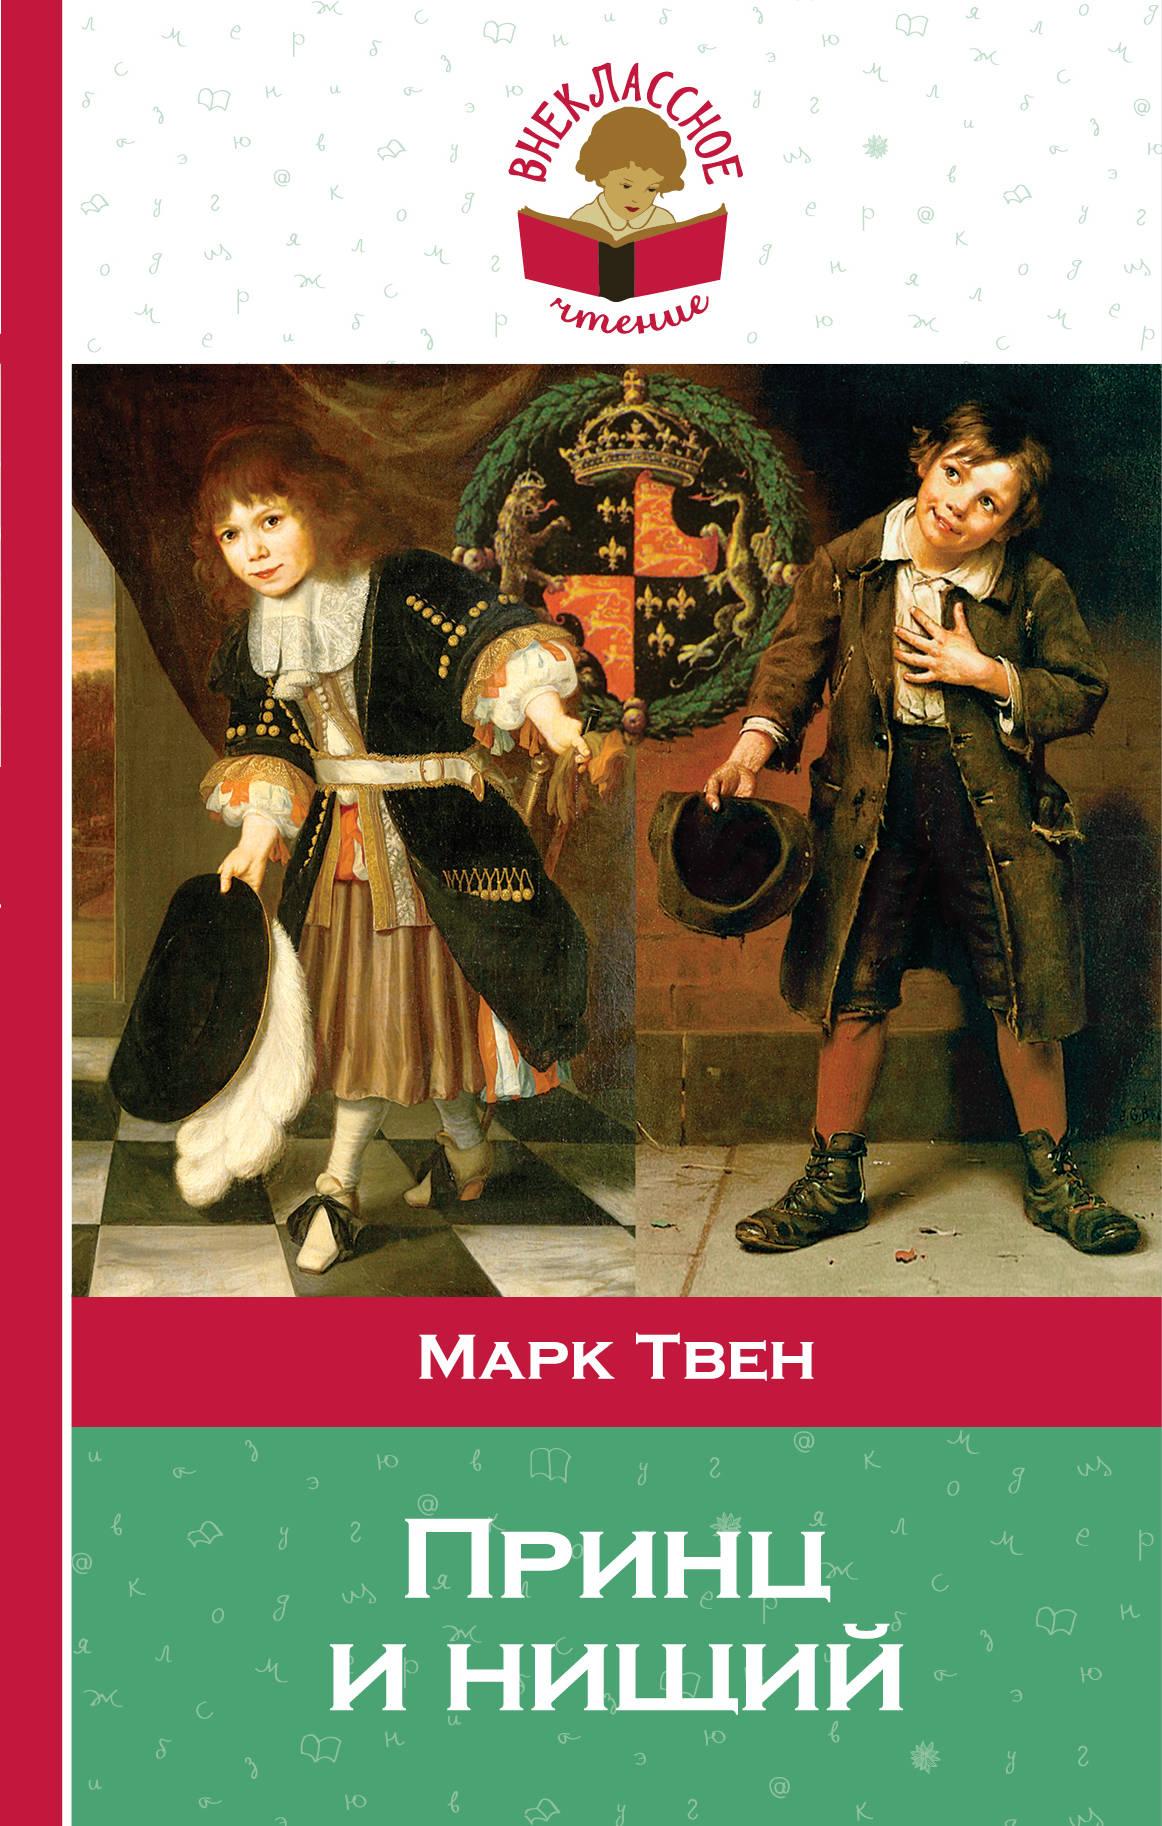 Твен Марк Принц и нищий твен марк the prince and the pauper принц и нищий уровень 2 isbn 978 5 17 091984 0